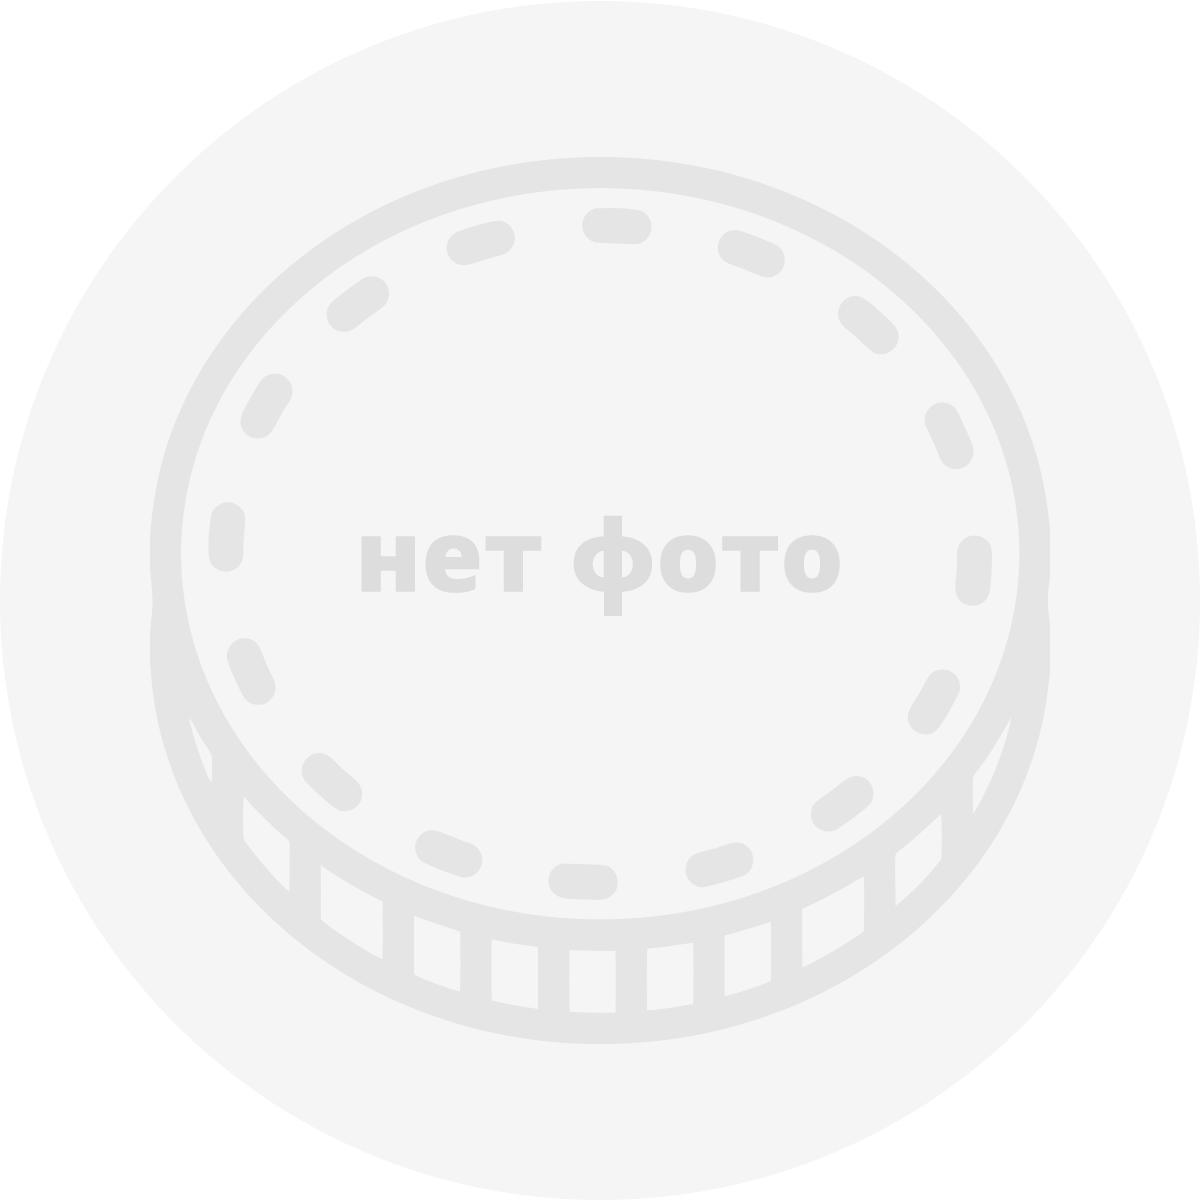 Теркс и Кайкос, 10 крон (1982 г.)